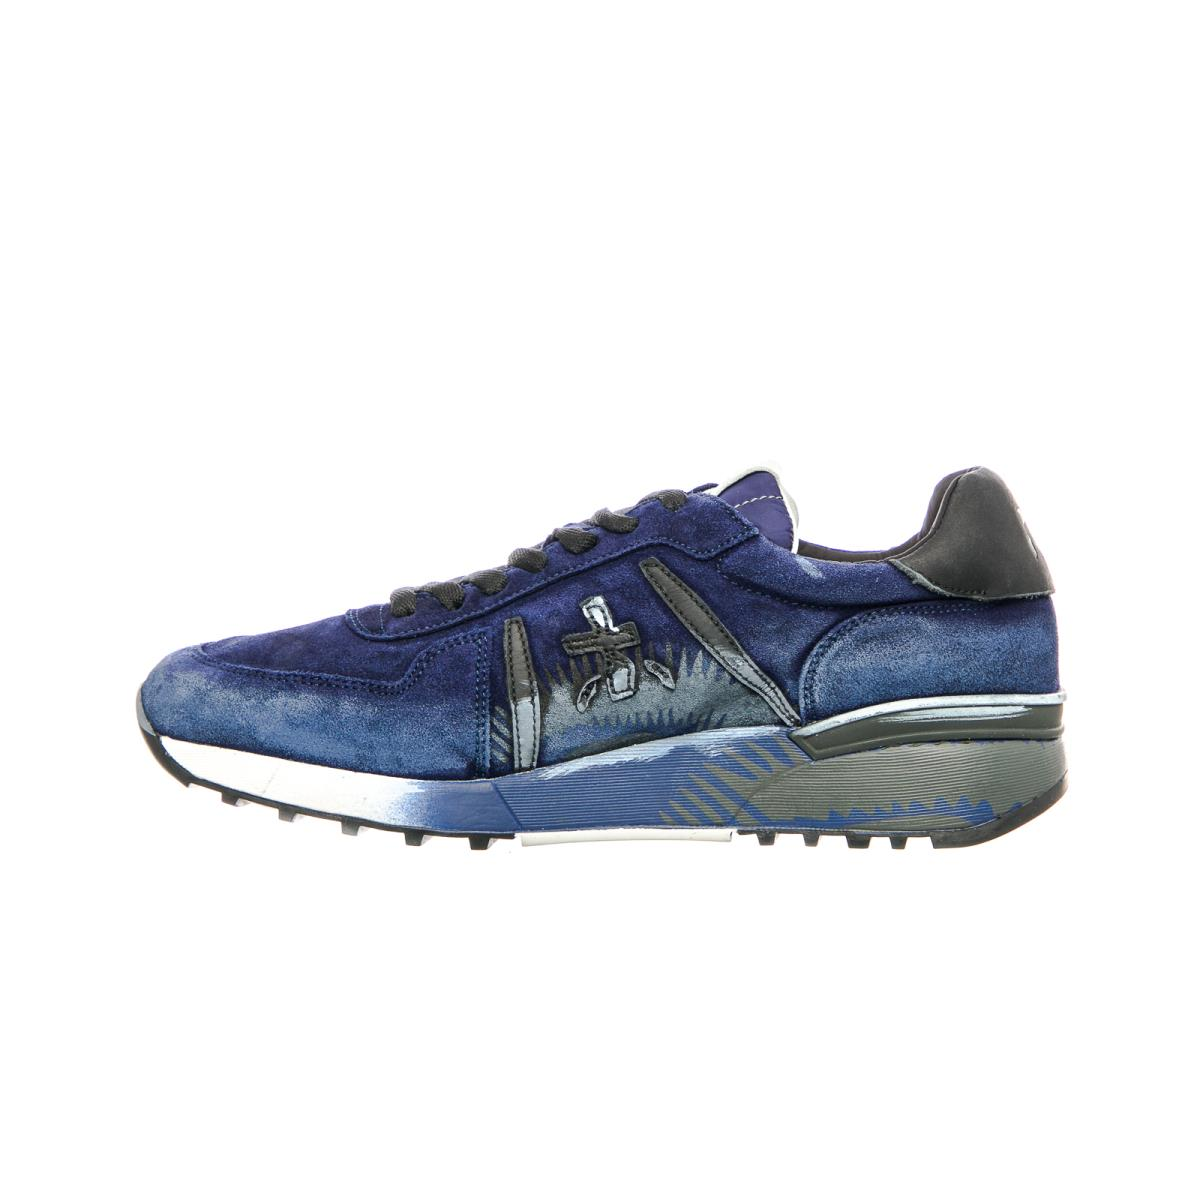 341984f35 sneakers-premiata-blu-brian-3574-3.jpg